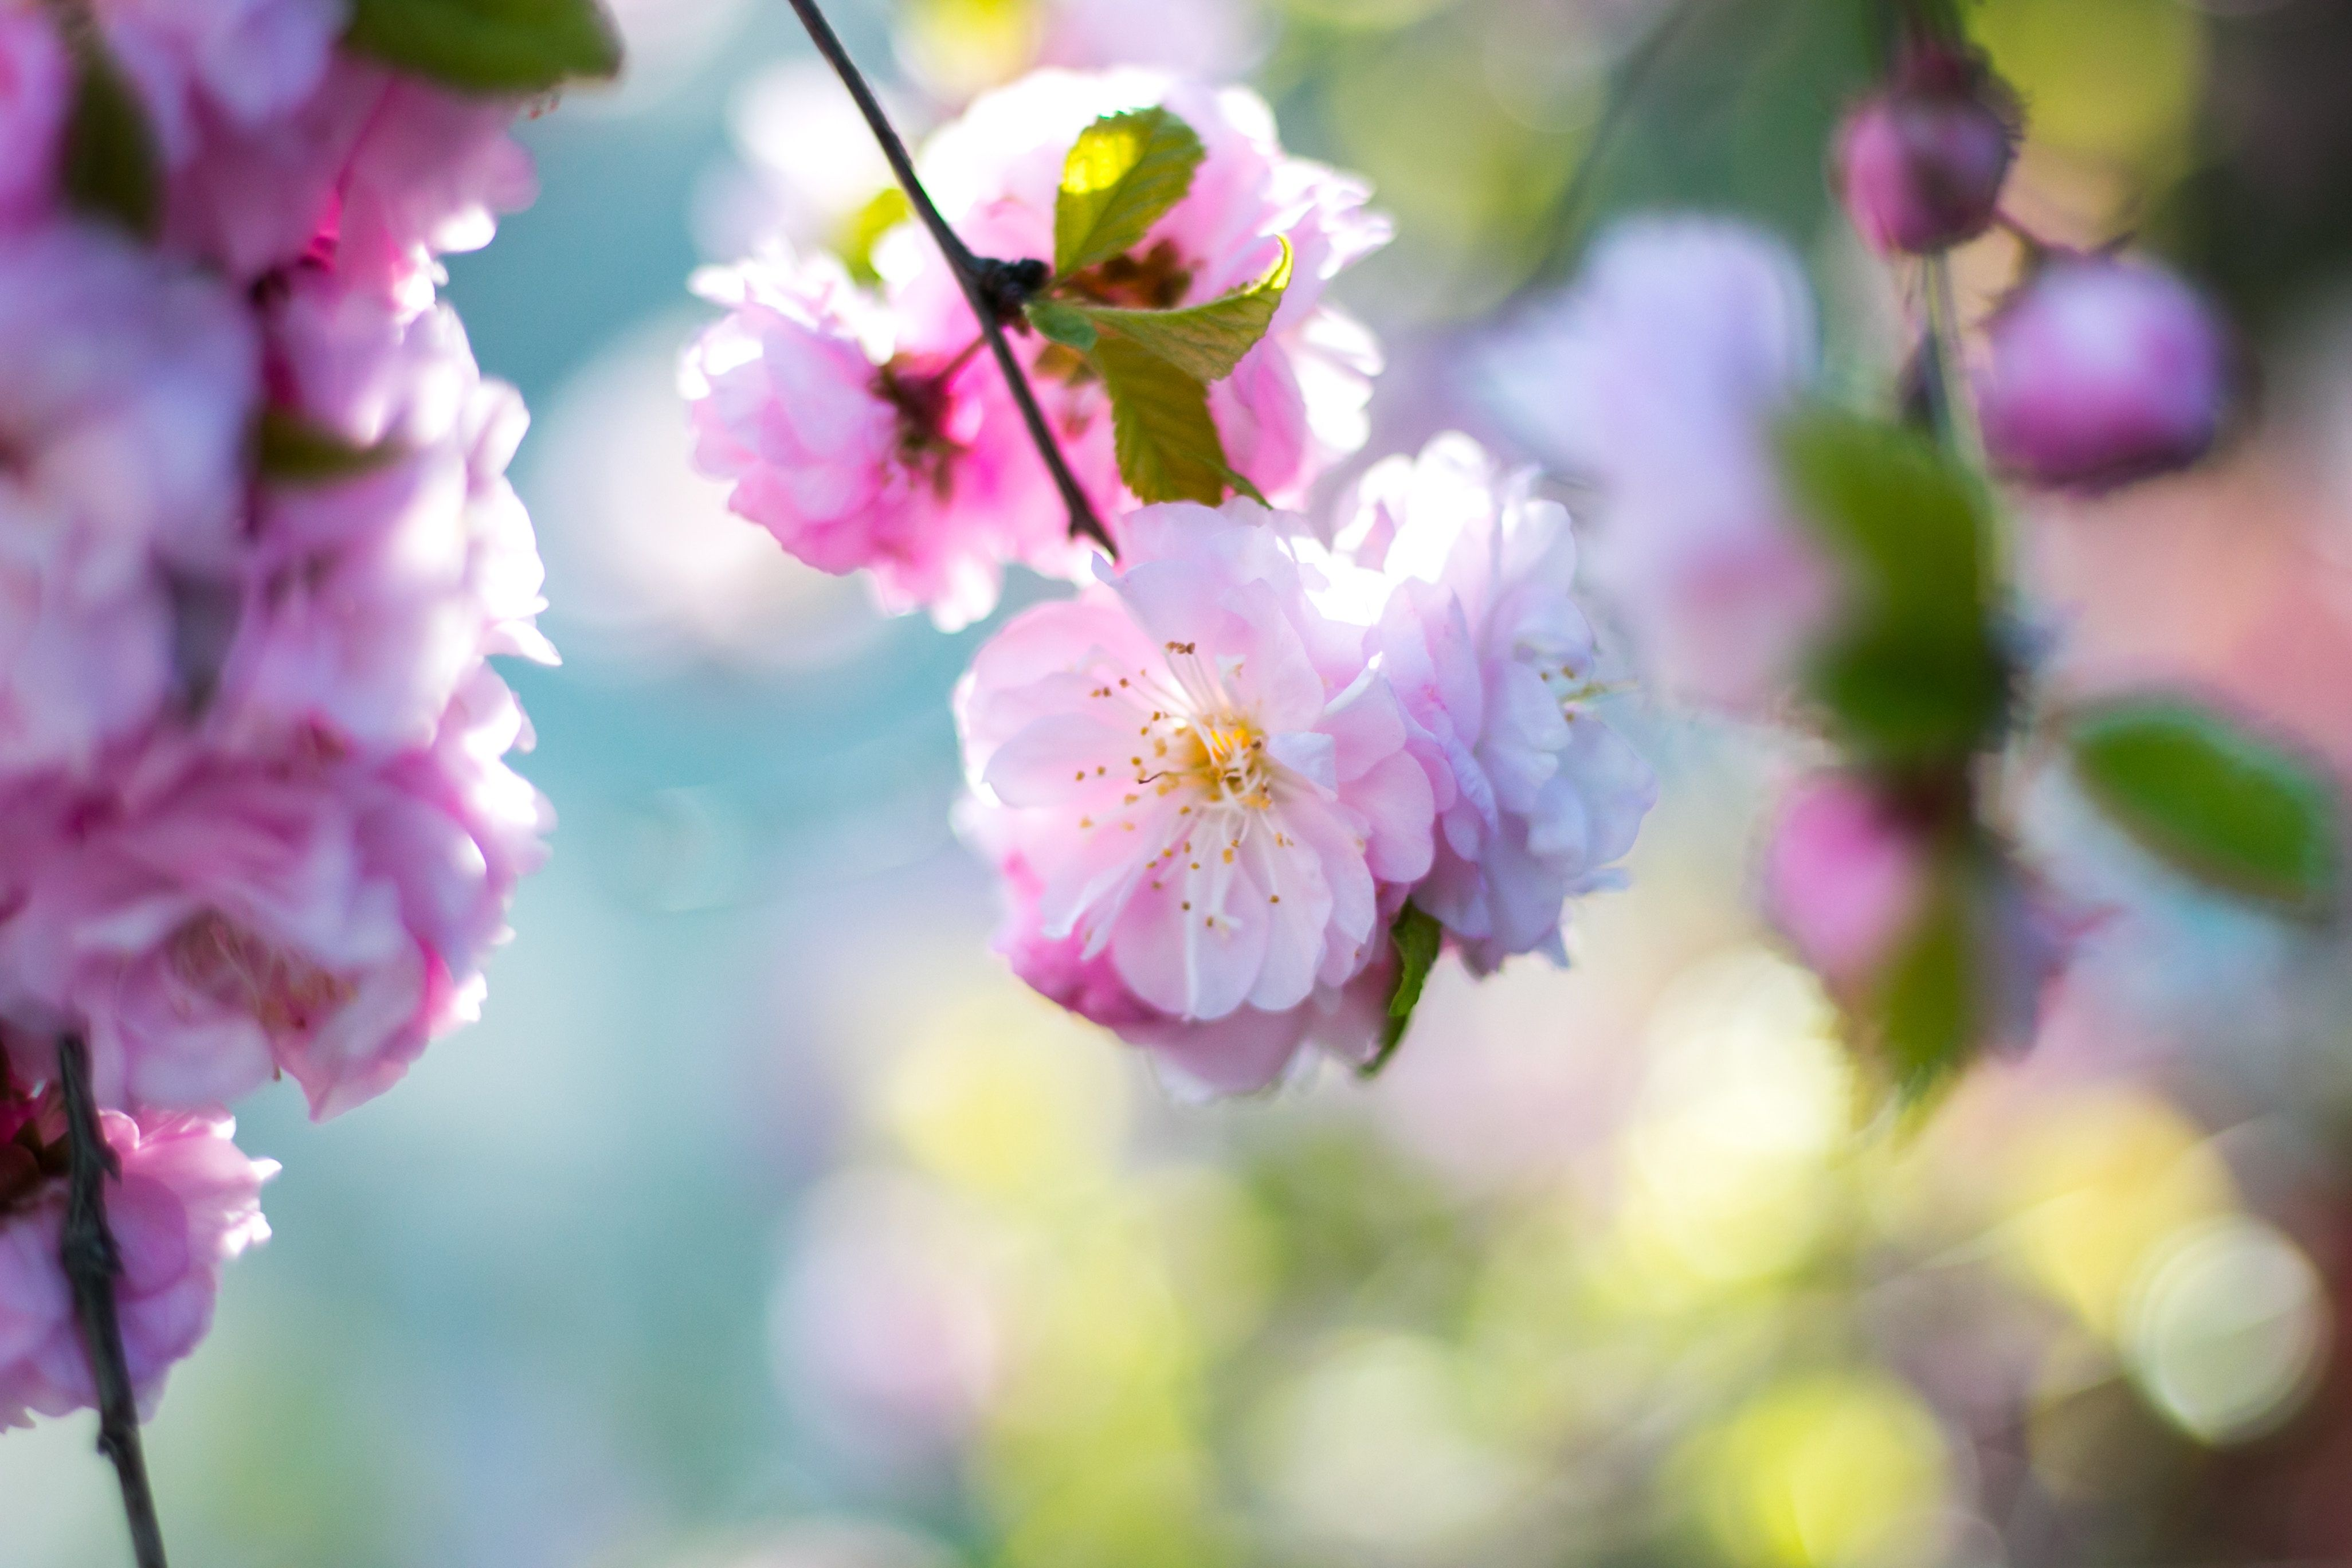 Cherry Blossom Tree Wallpaper 72 - [4104x2736]